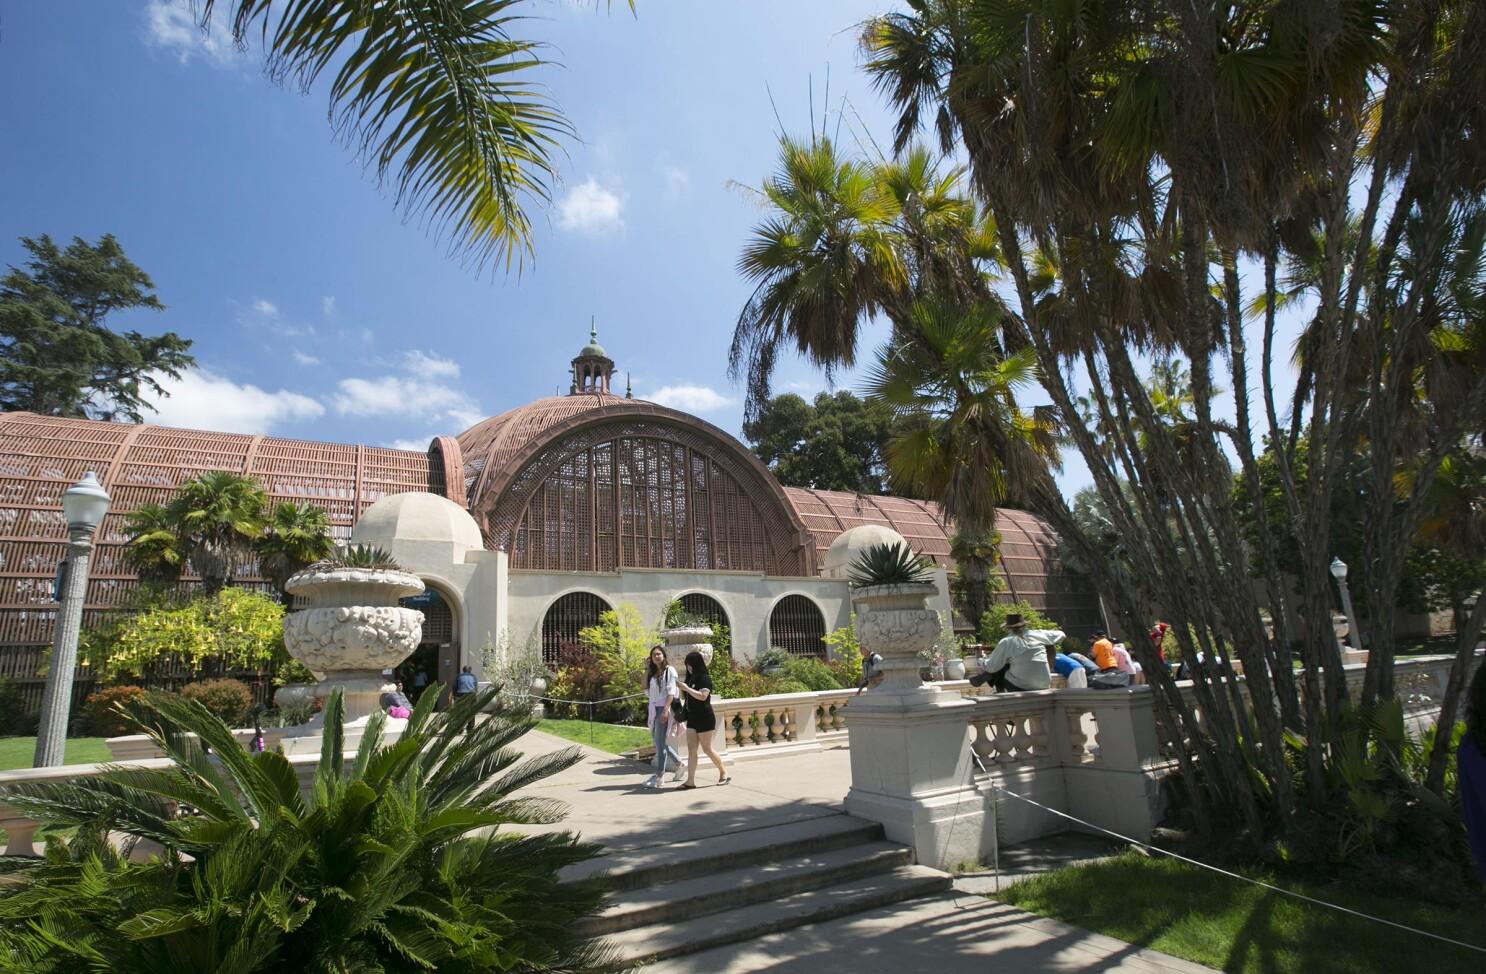 Balboa Park Beneficiary Of 8 Million State Gift To Renovate The Botanical Building The San Diego Union Tribune